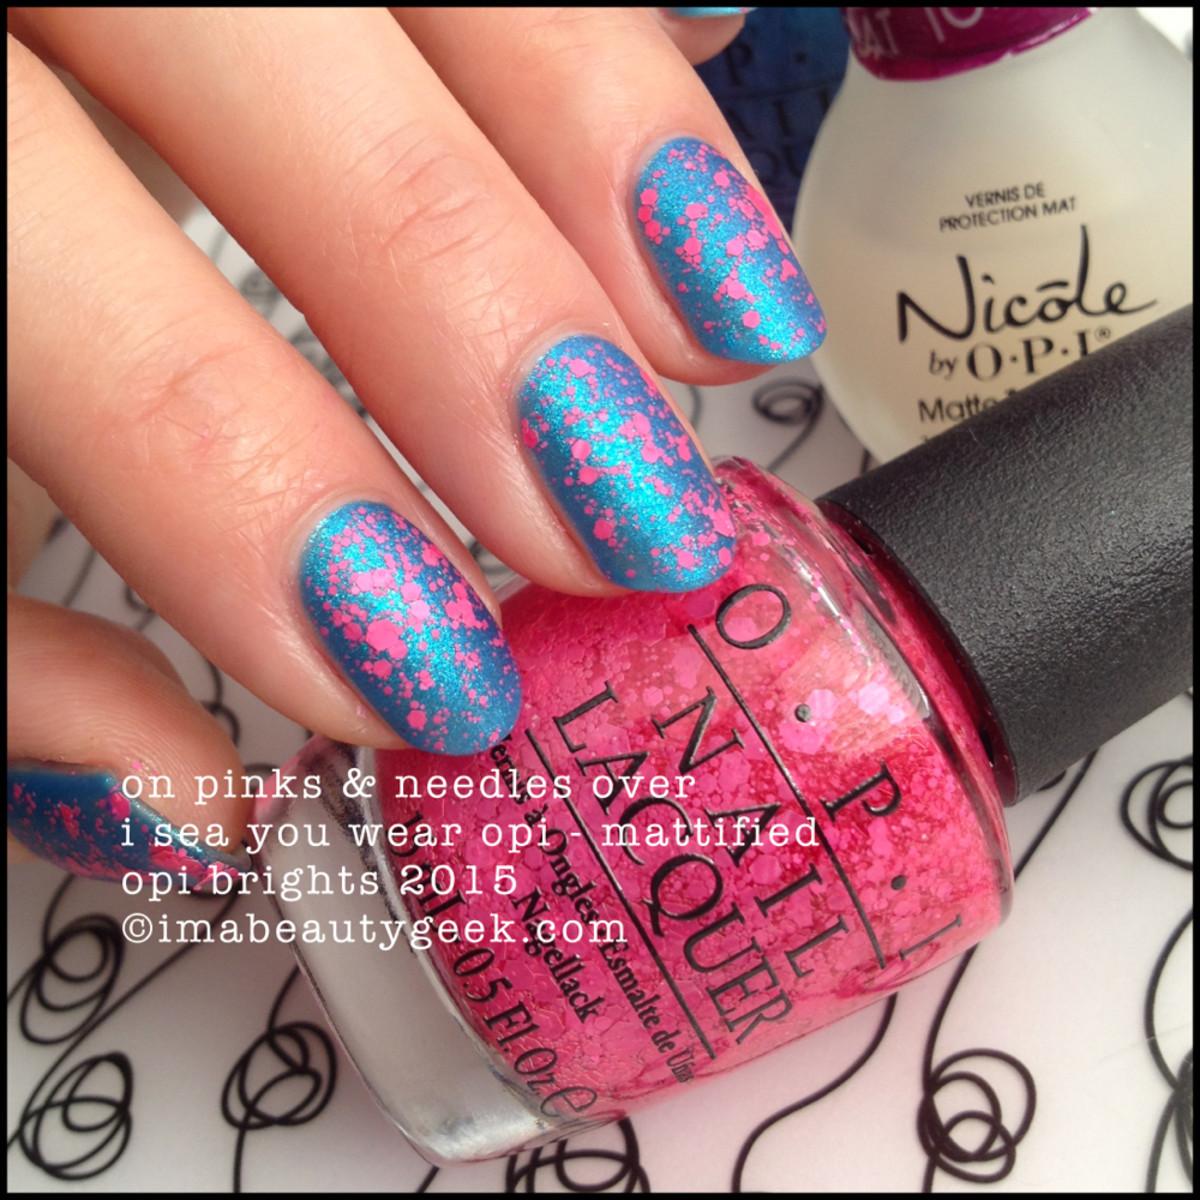 OPI Brights 2015_OPI On Pinks & Needles over I Sea You Wear OPI Matte